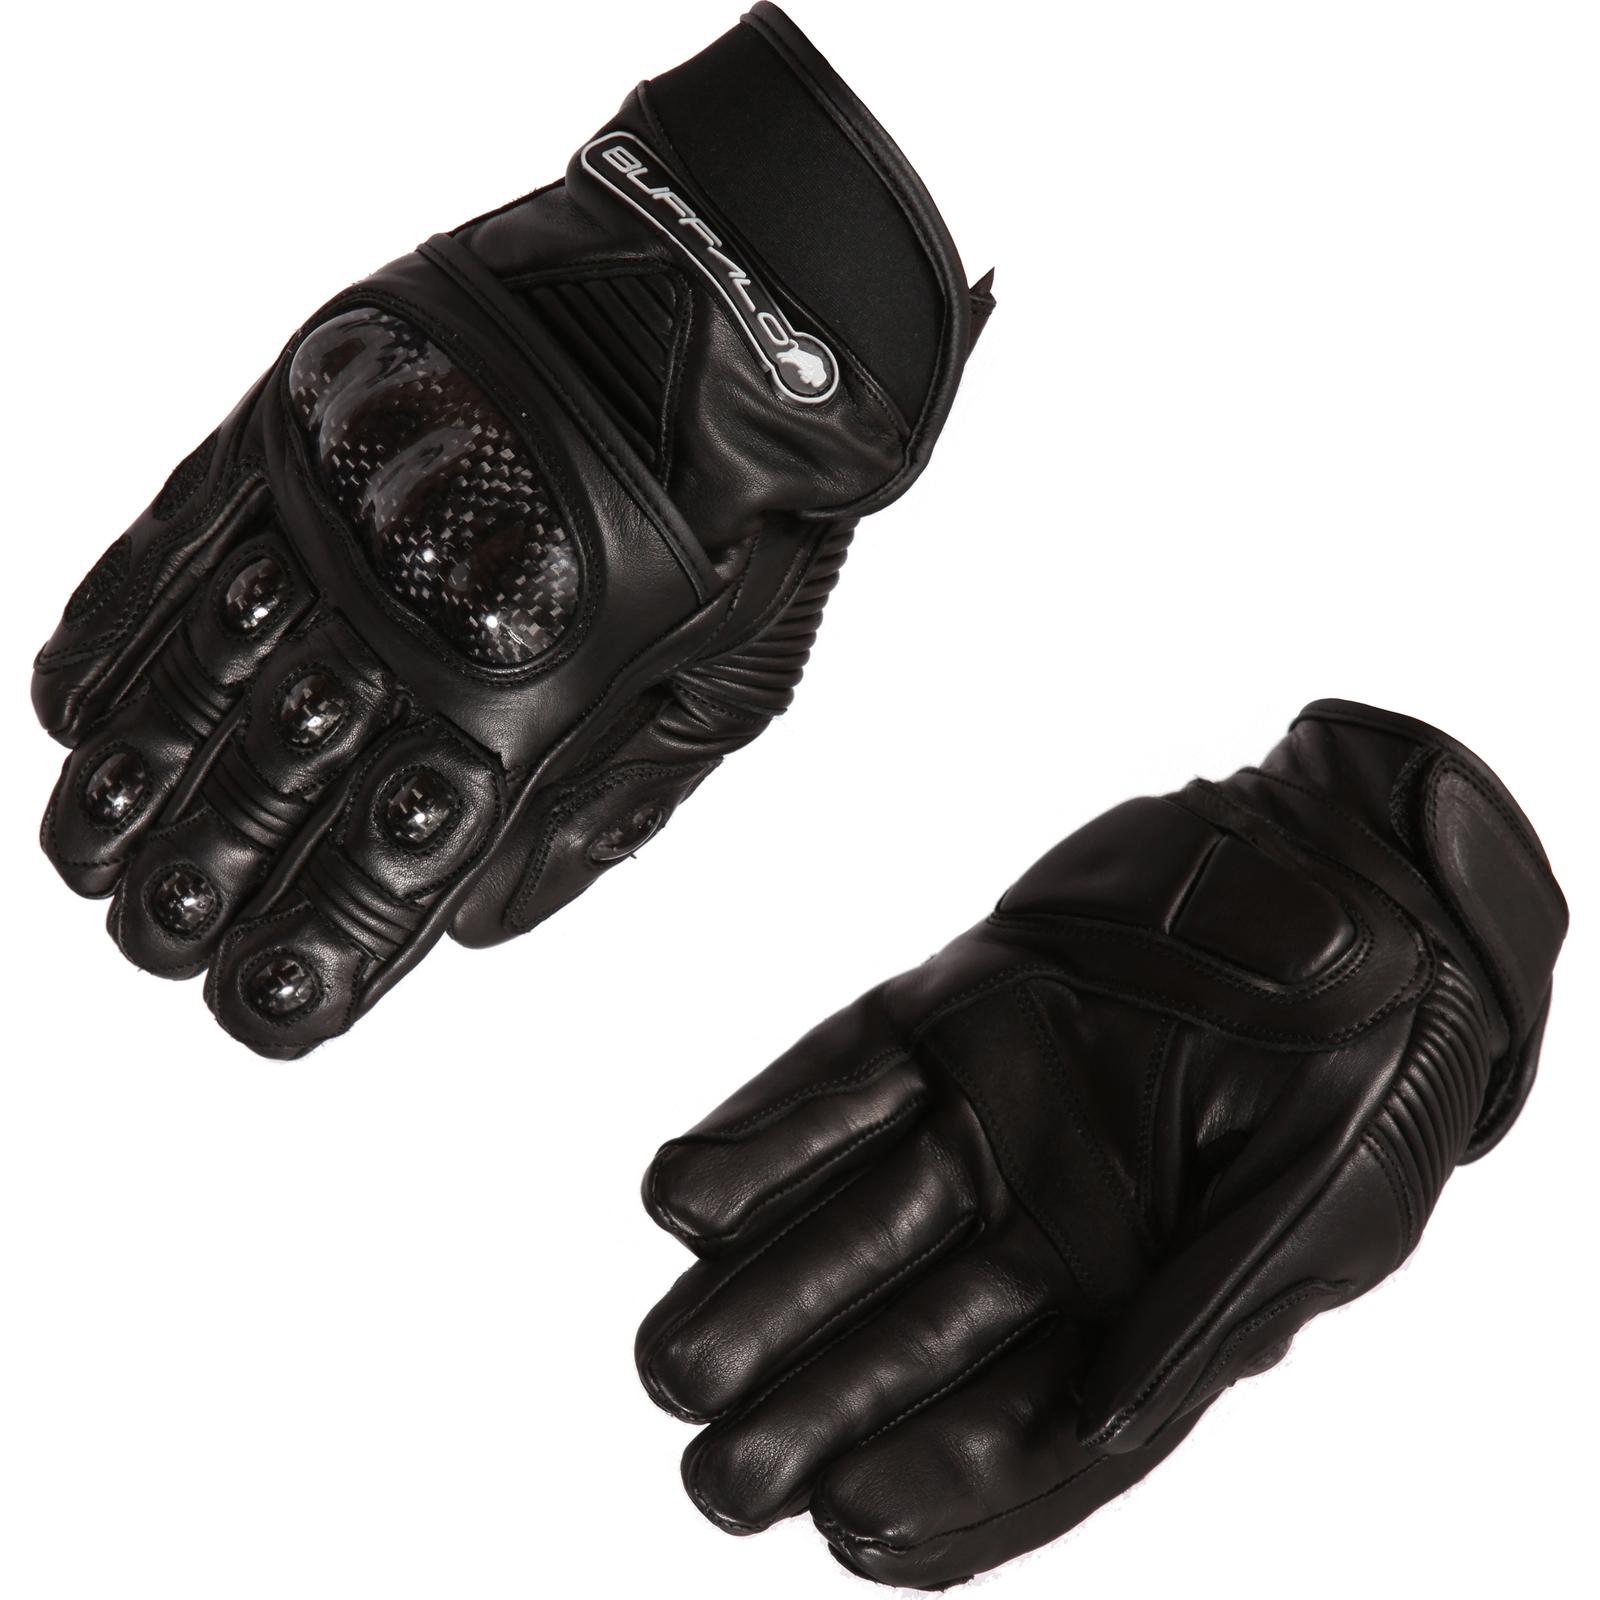 Motorcycle knuckle gloves - Buffalo Corto Motorcycle Gloves Short Bike Street Urban